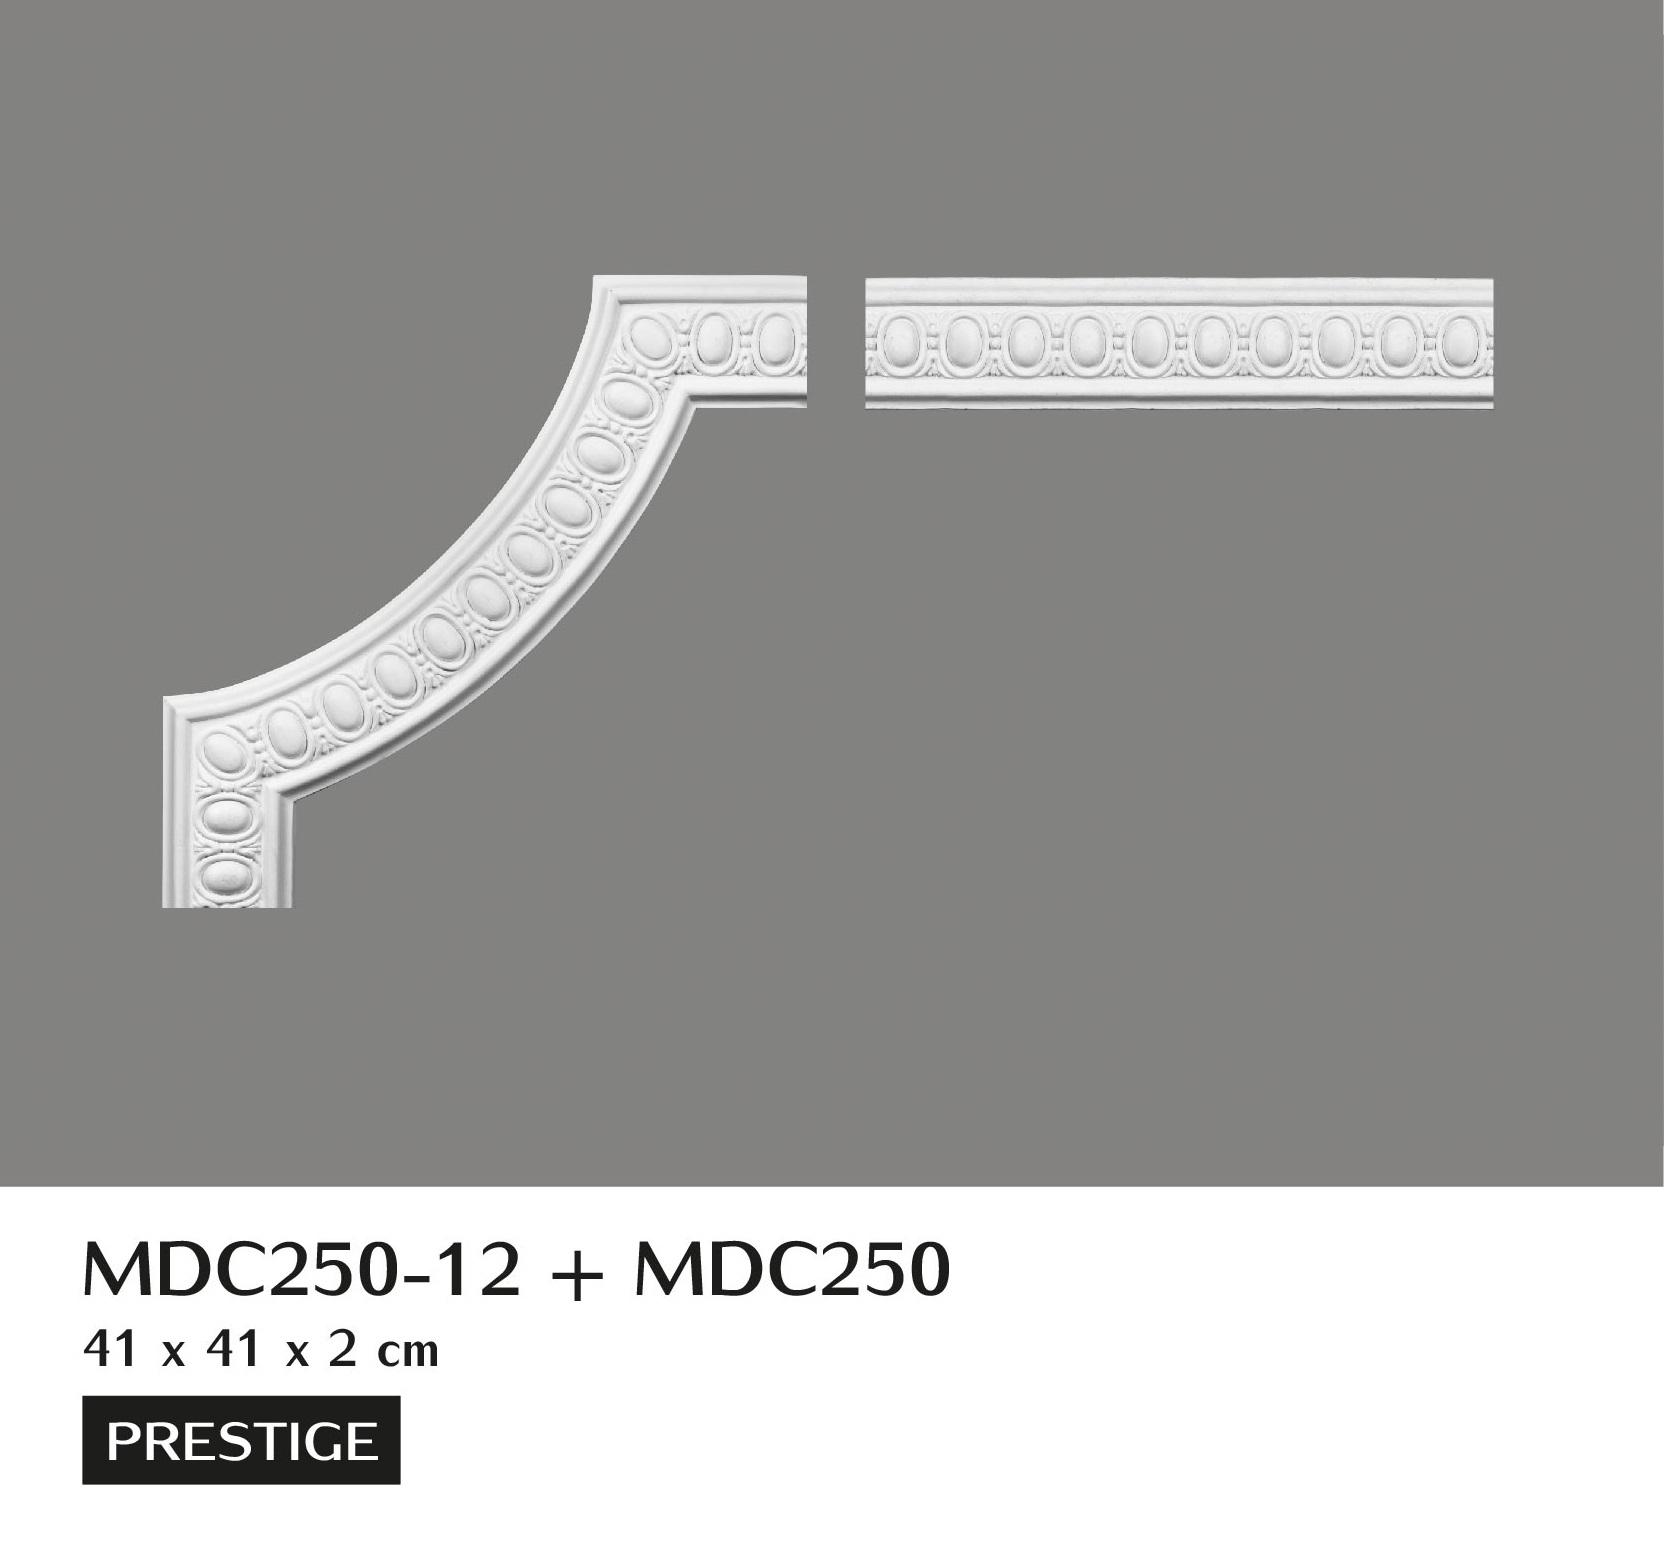 Mdc250 12